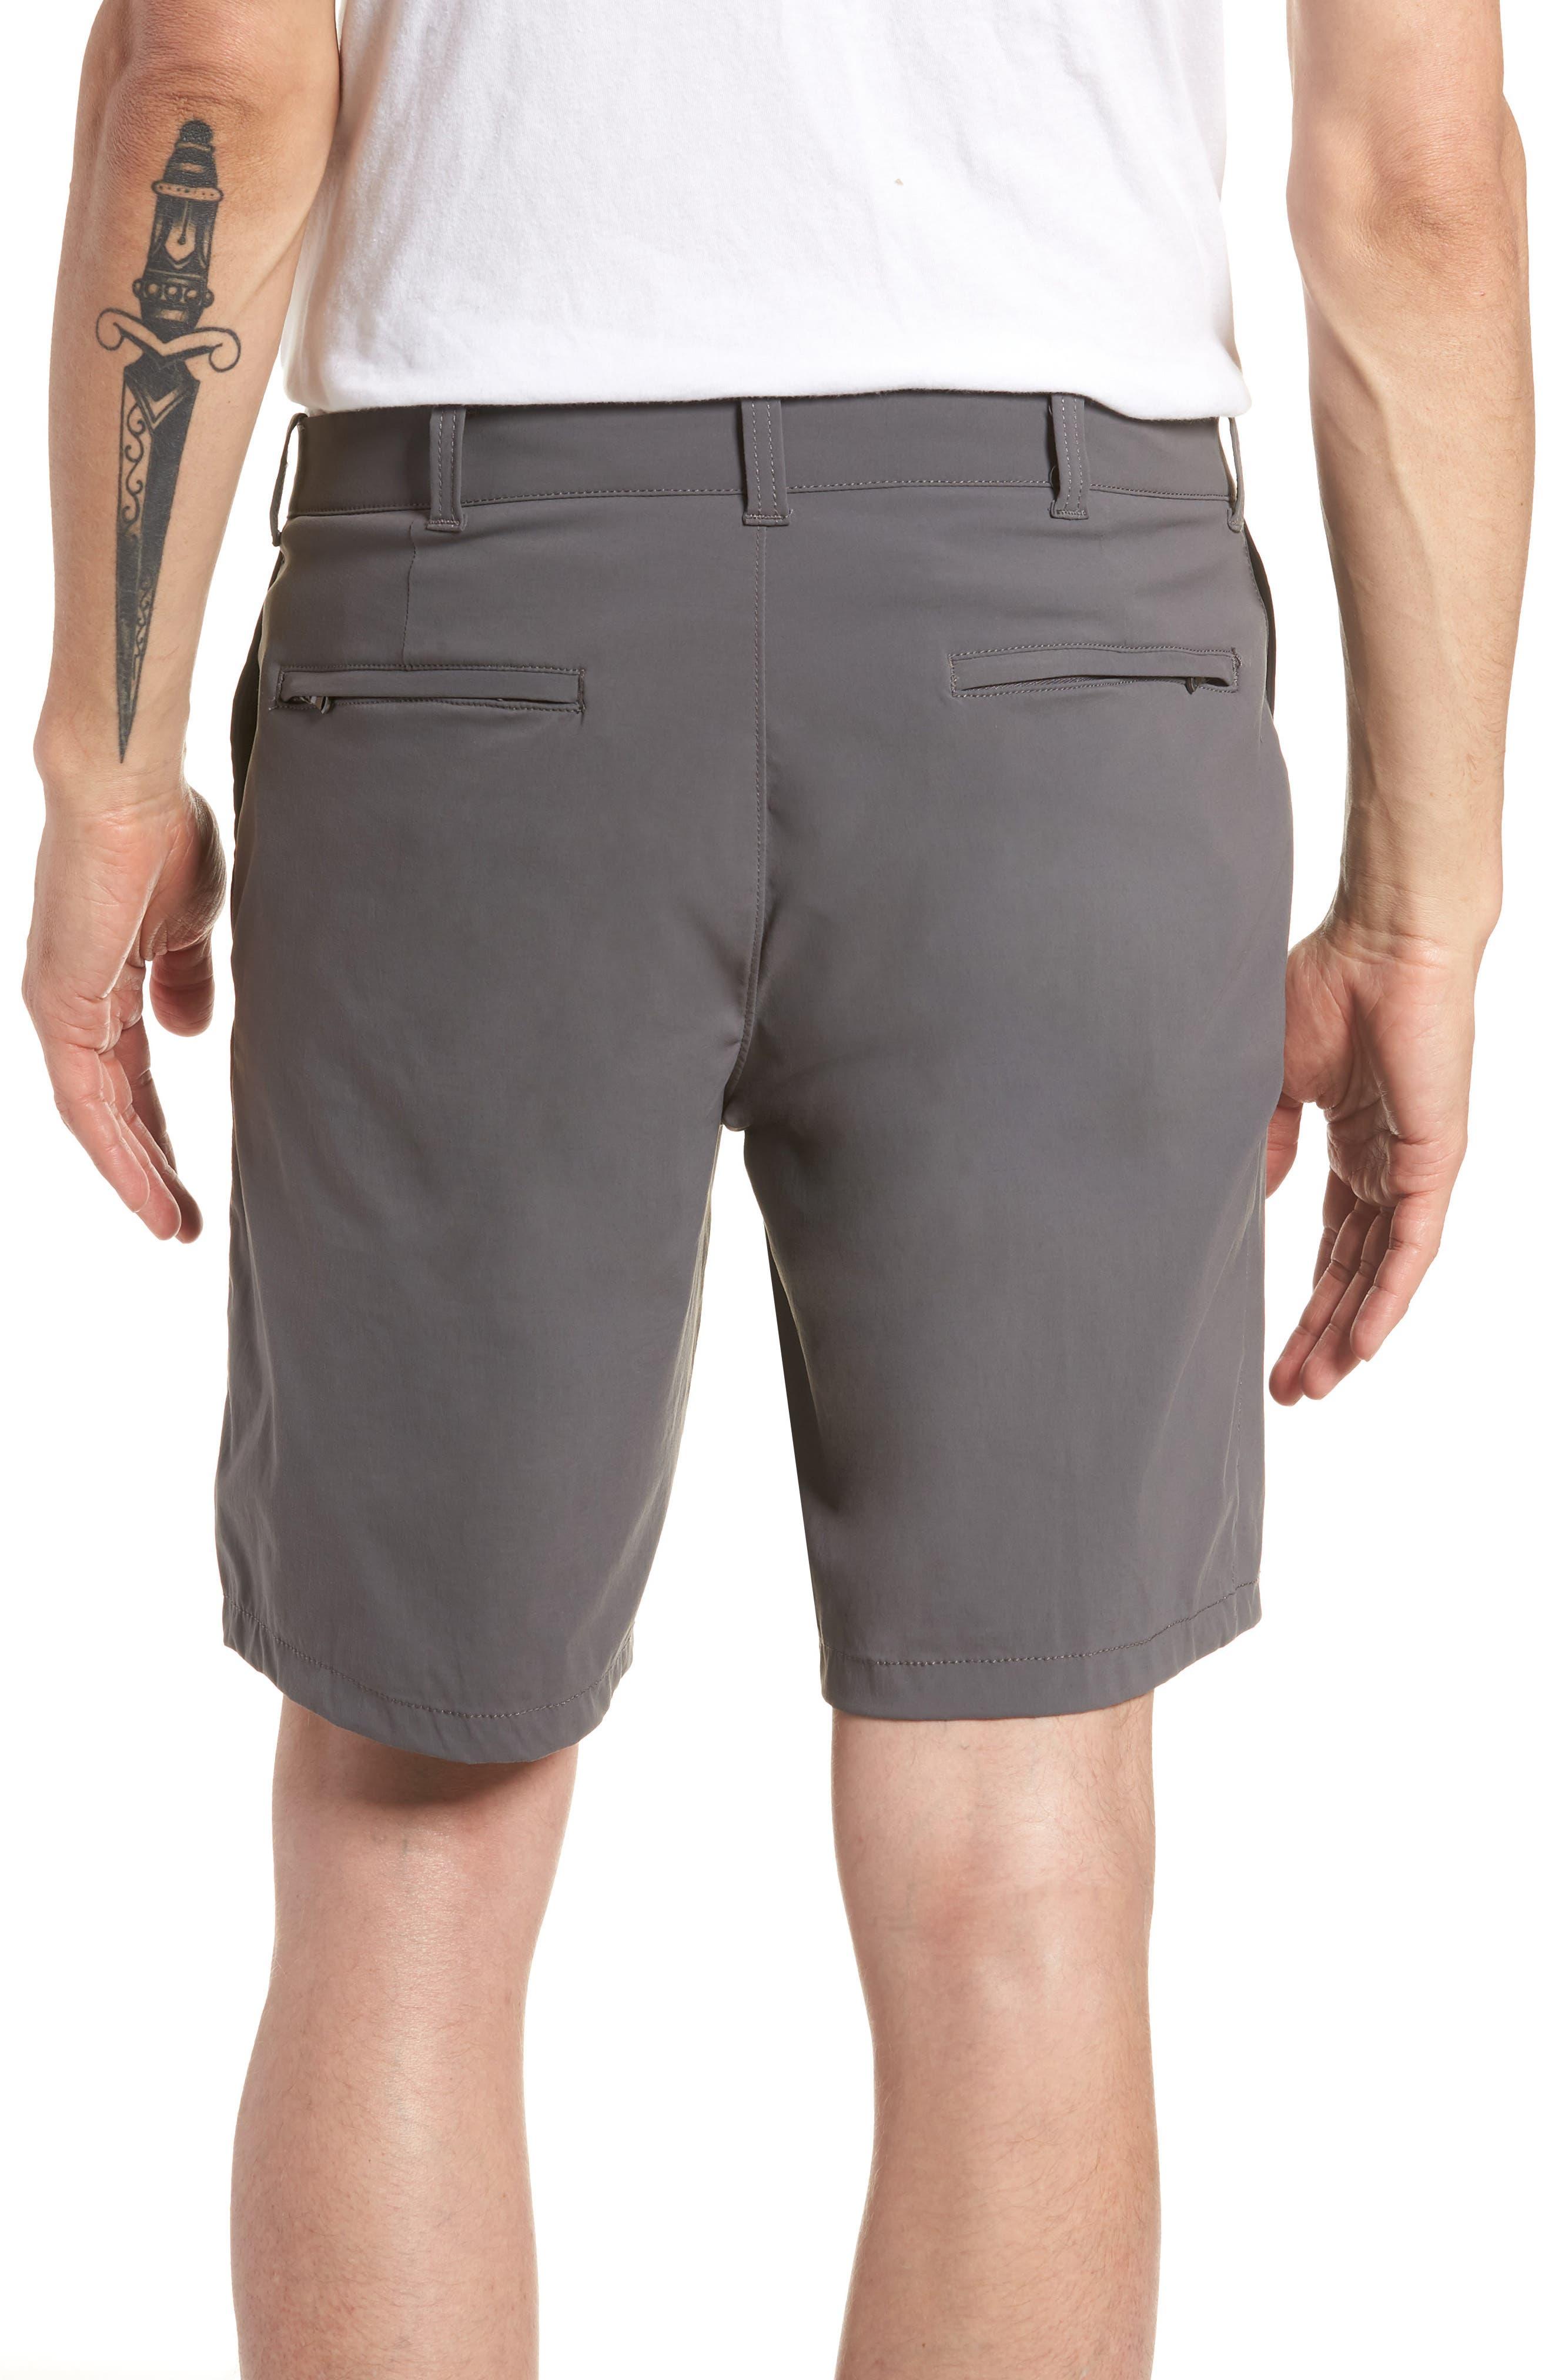 Tech Shorts,                             Alternate thumbnail 2, color,                             020